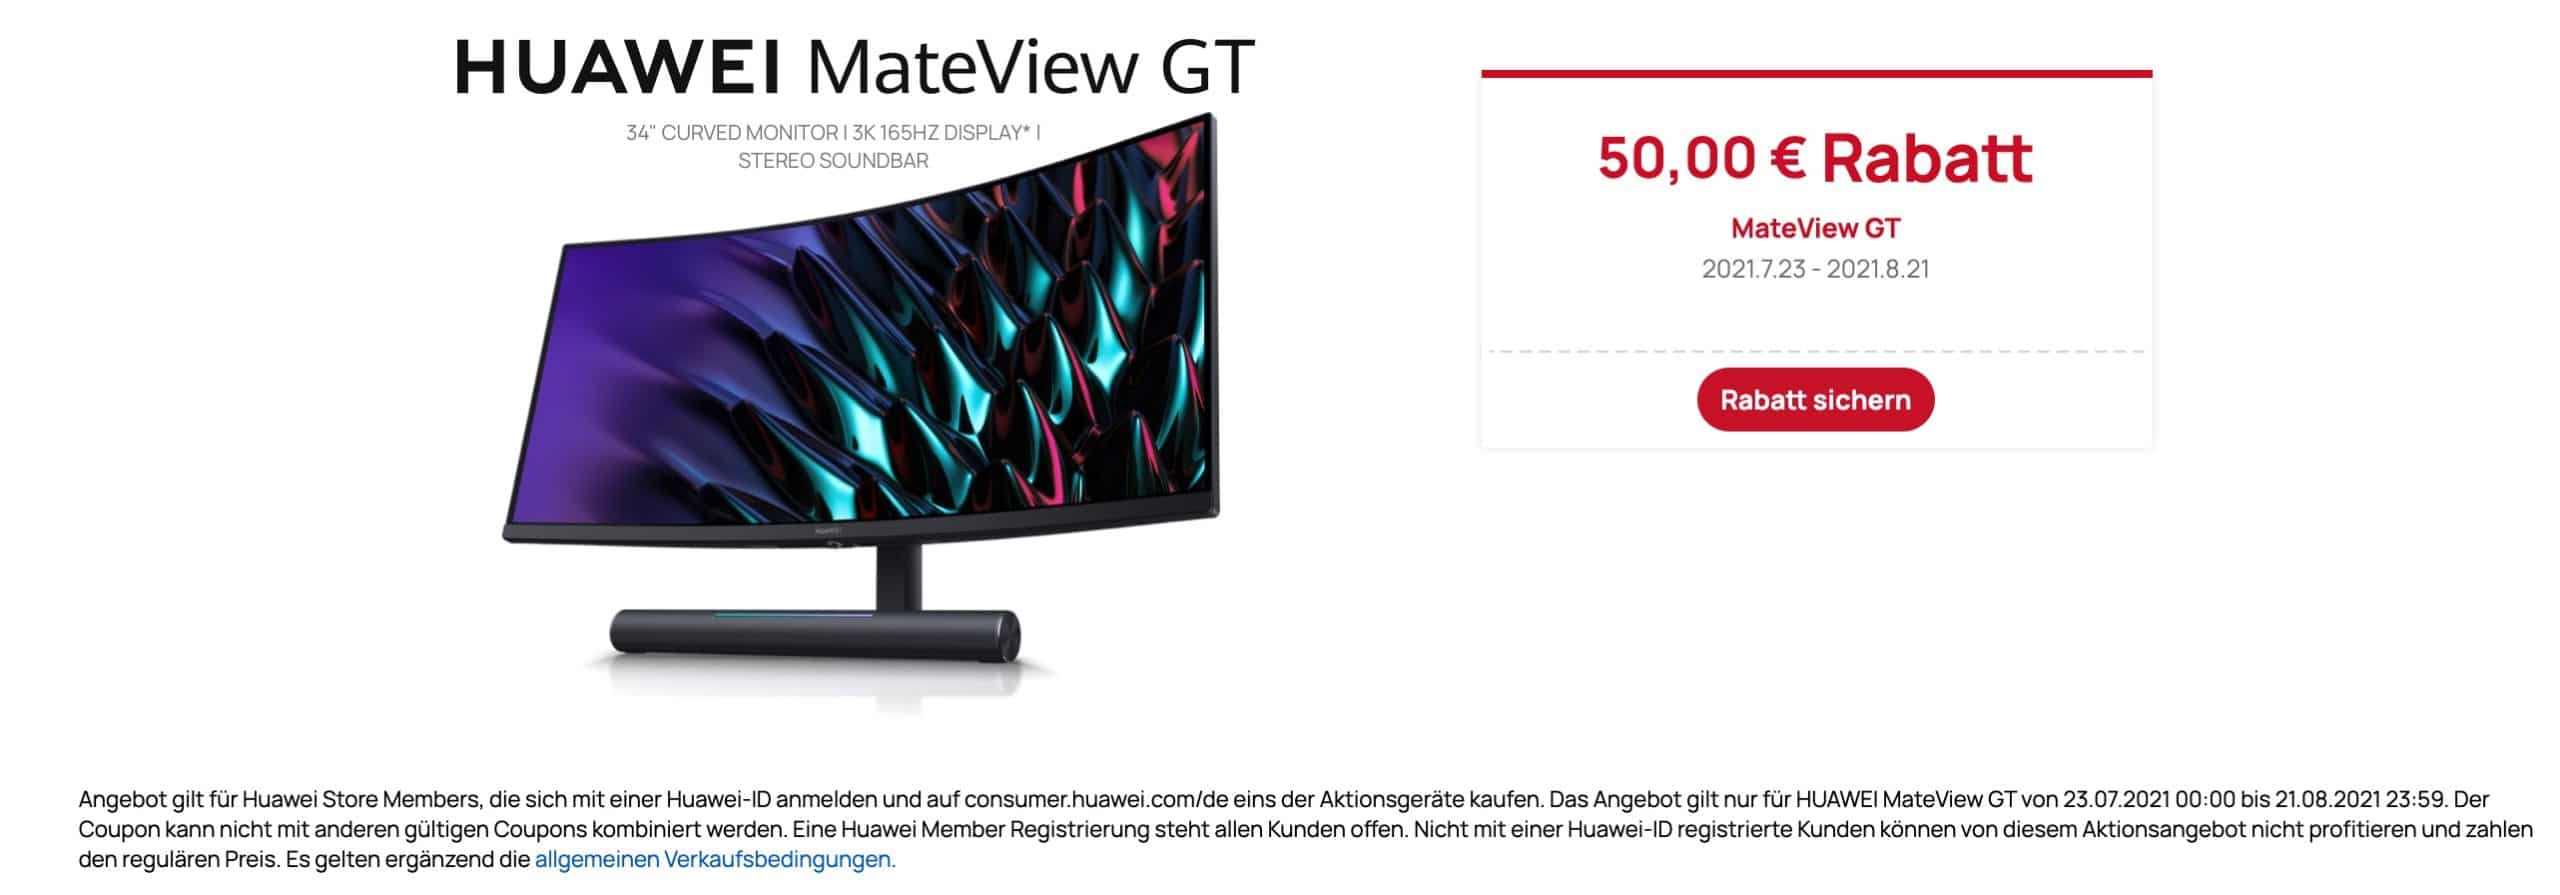 Huawei MateView GT 34 Zoll Gaming Monitor Rabatt  scaled